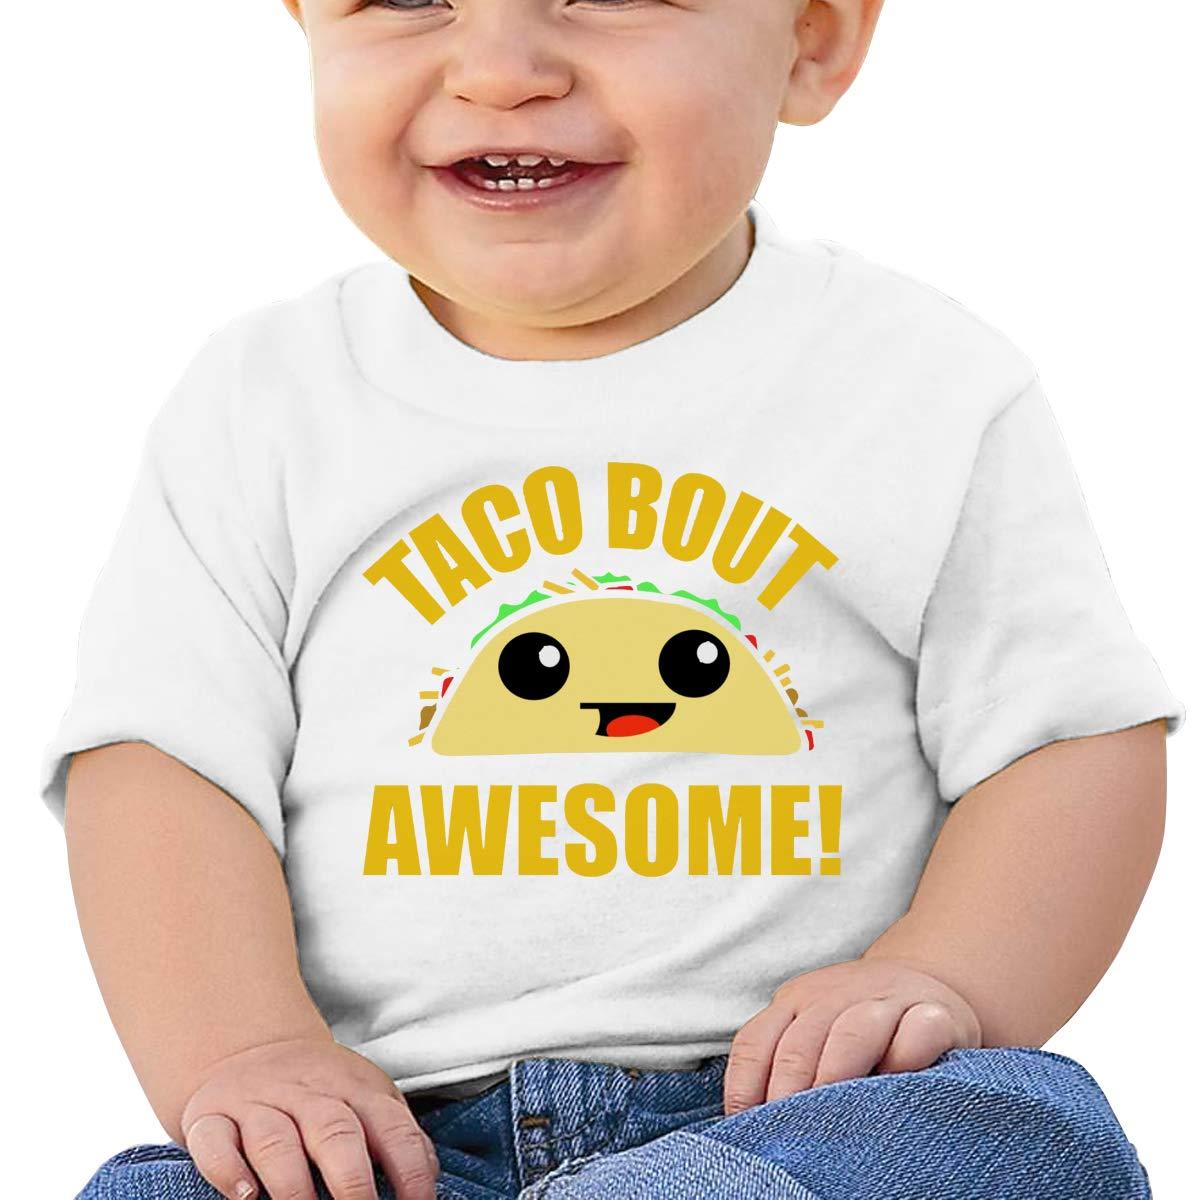 SakanpoTaco Bout Awesome Toddler//Infant Short Sleeve Cotton T Shirts White